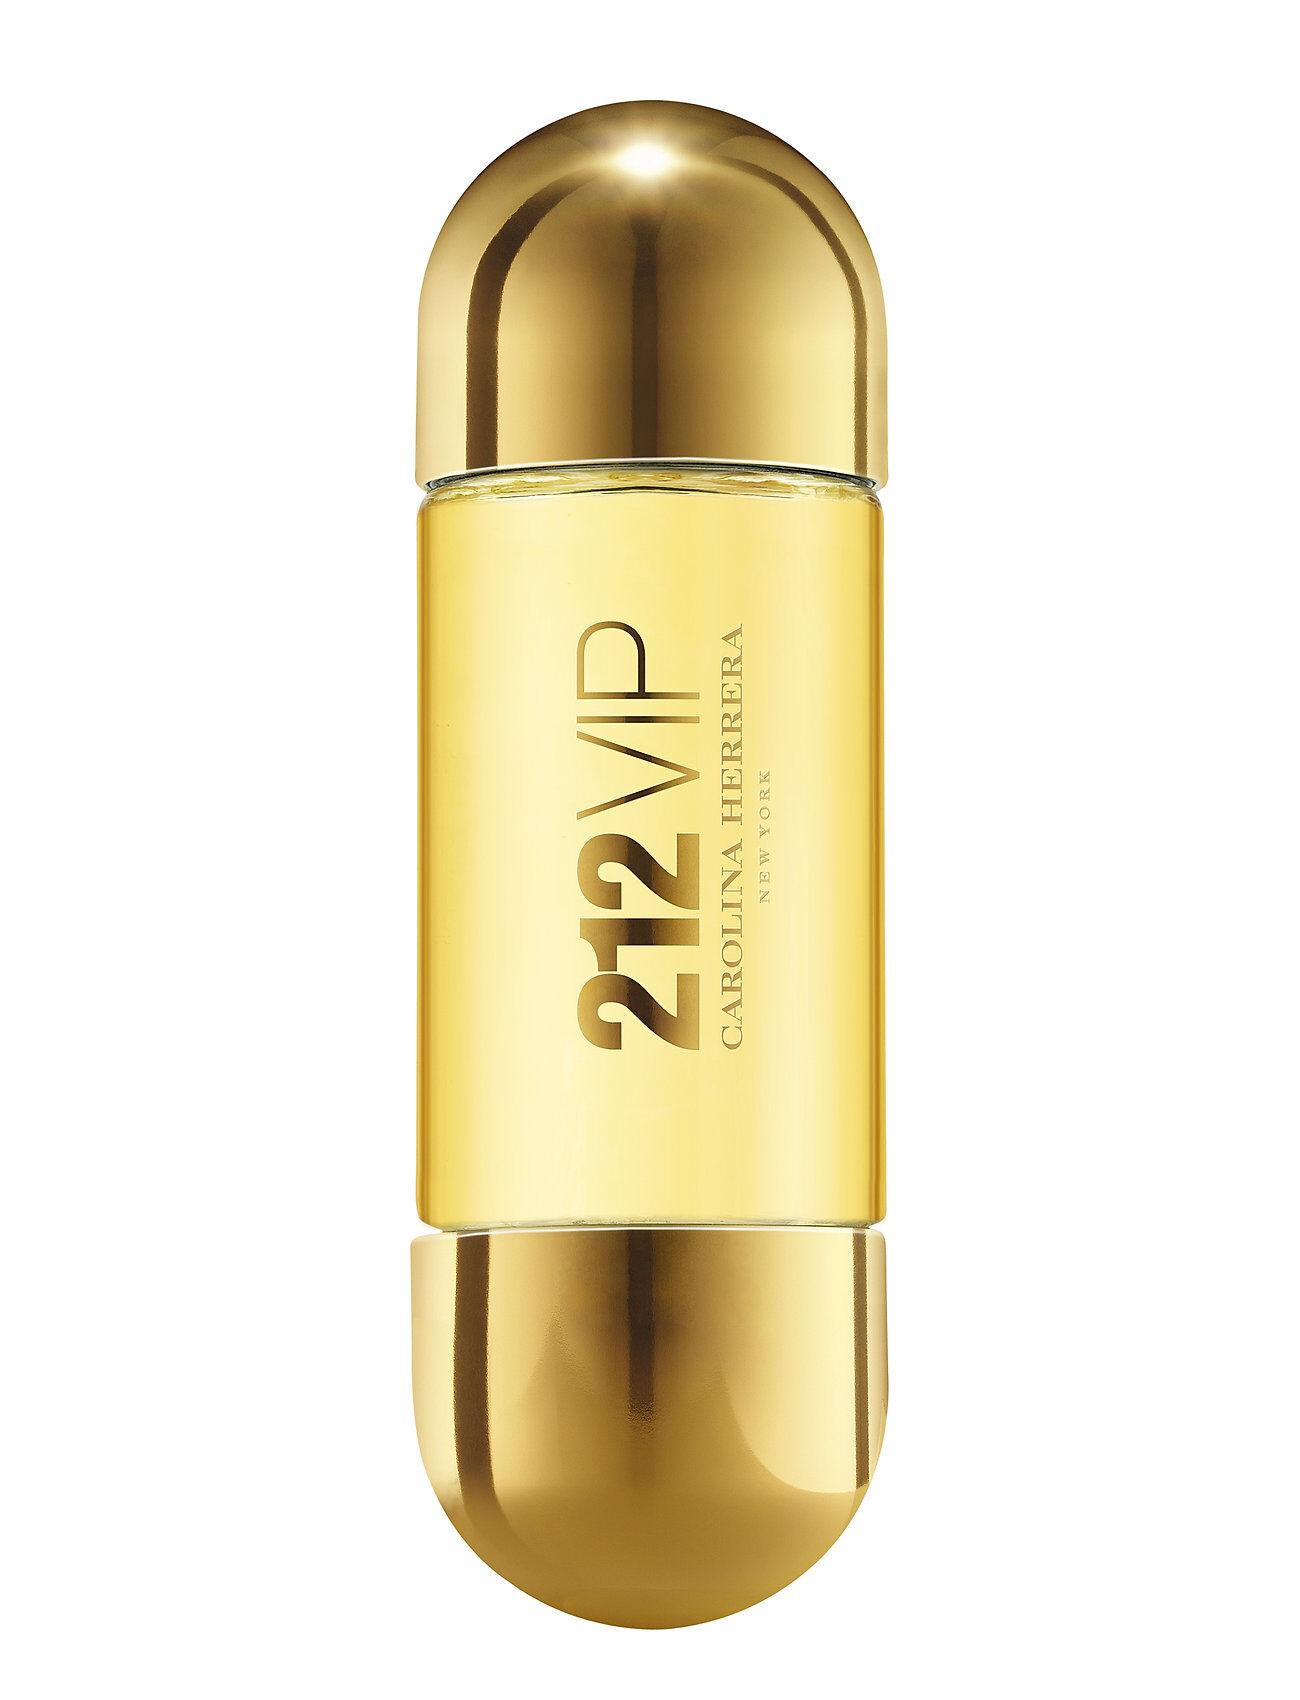 Image of Carolina Herrera 212 Vip Eau De Parfum Hajuvesi Eau De Parfum